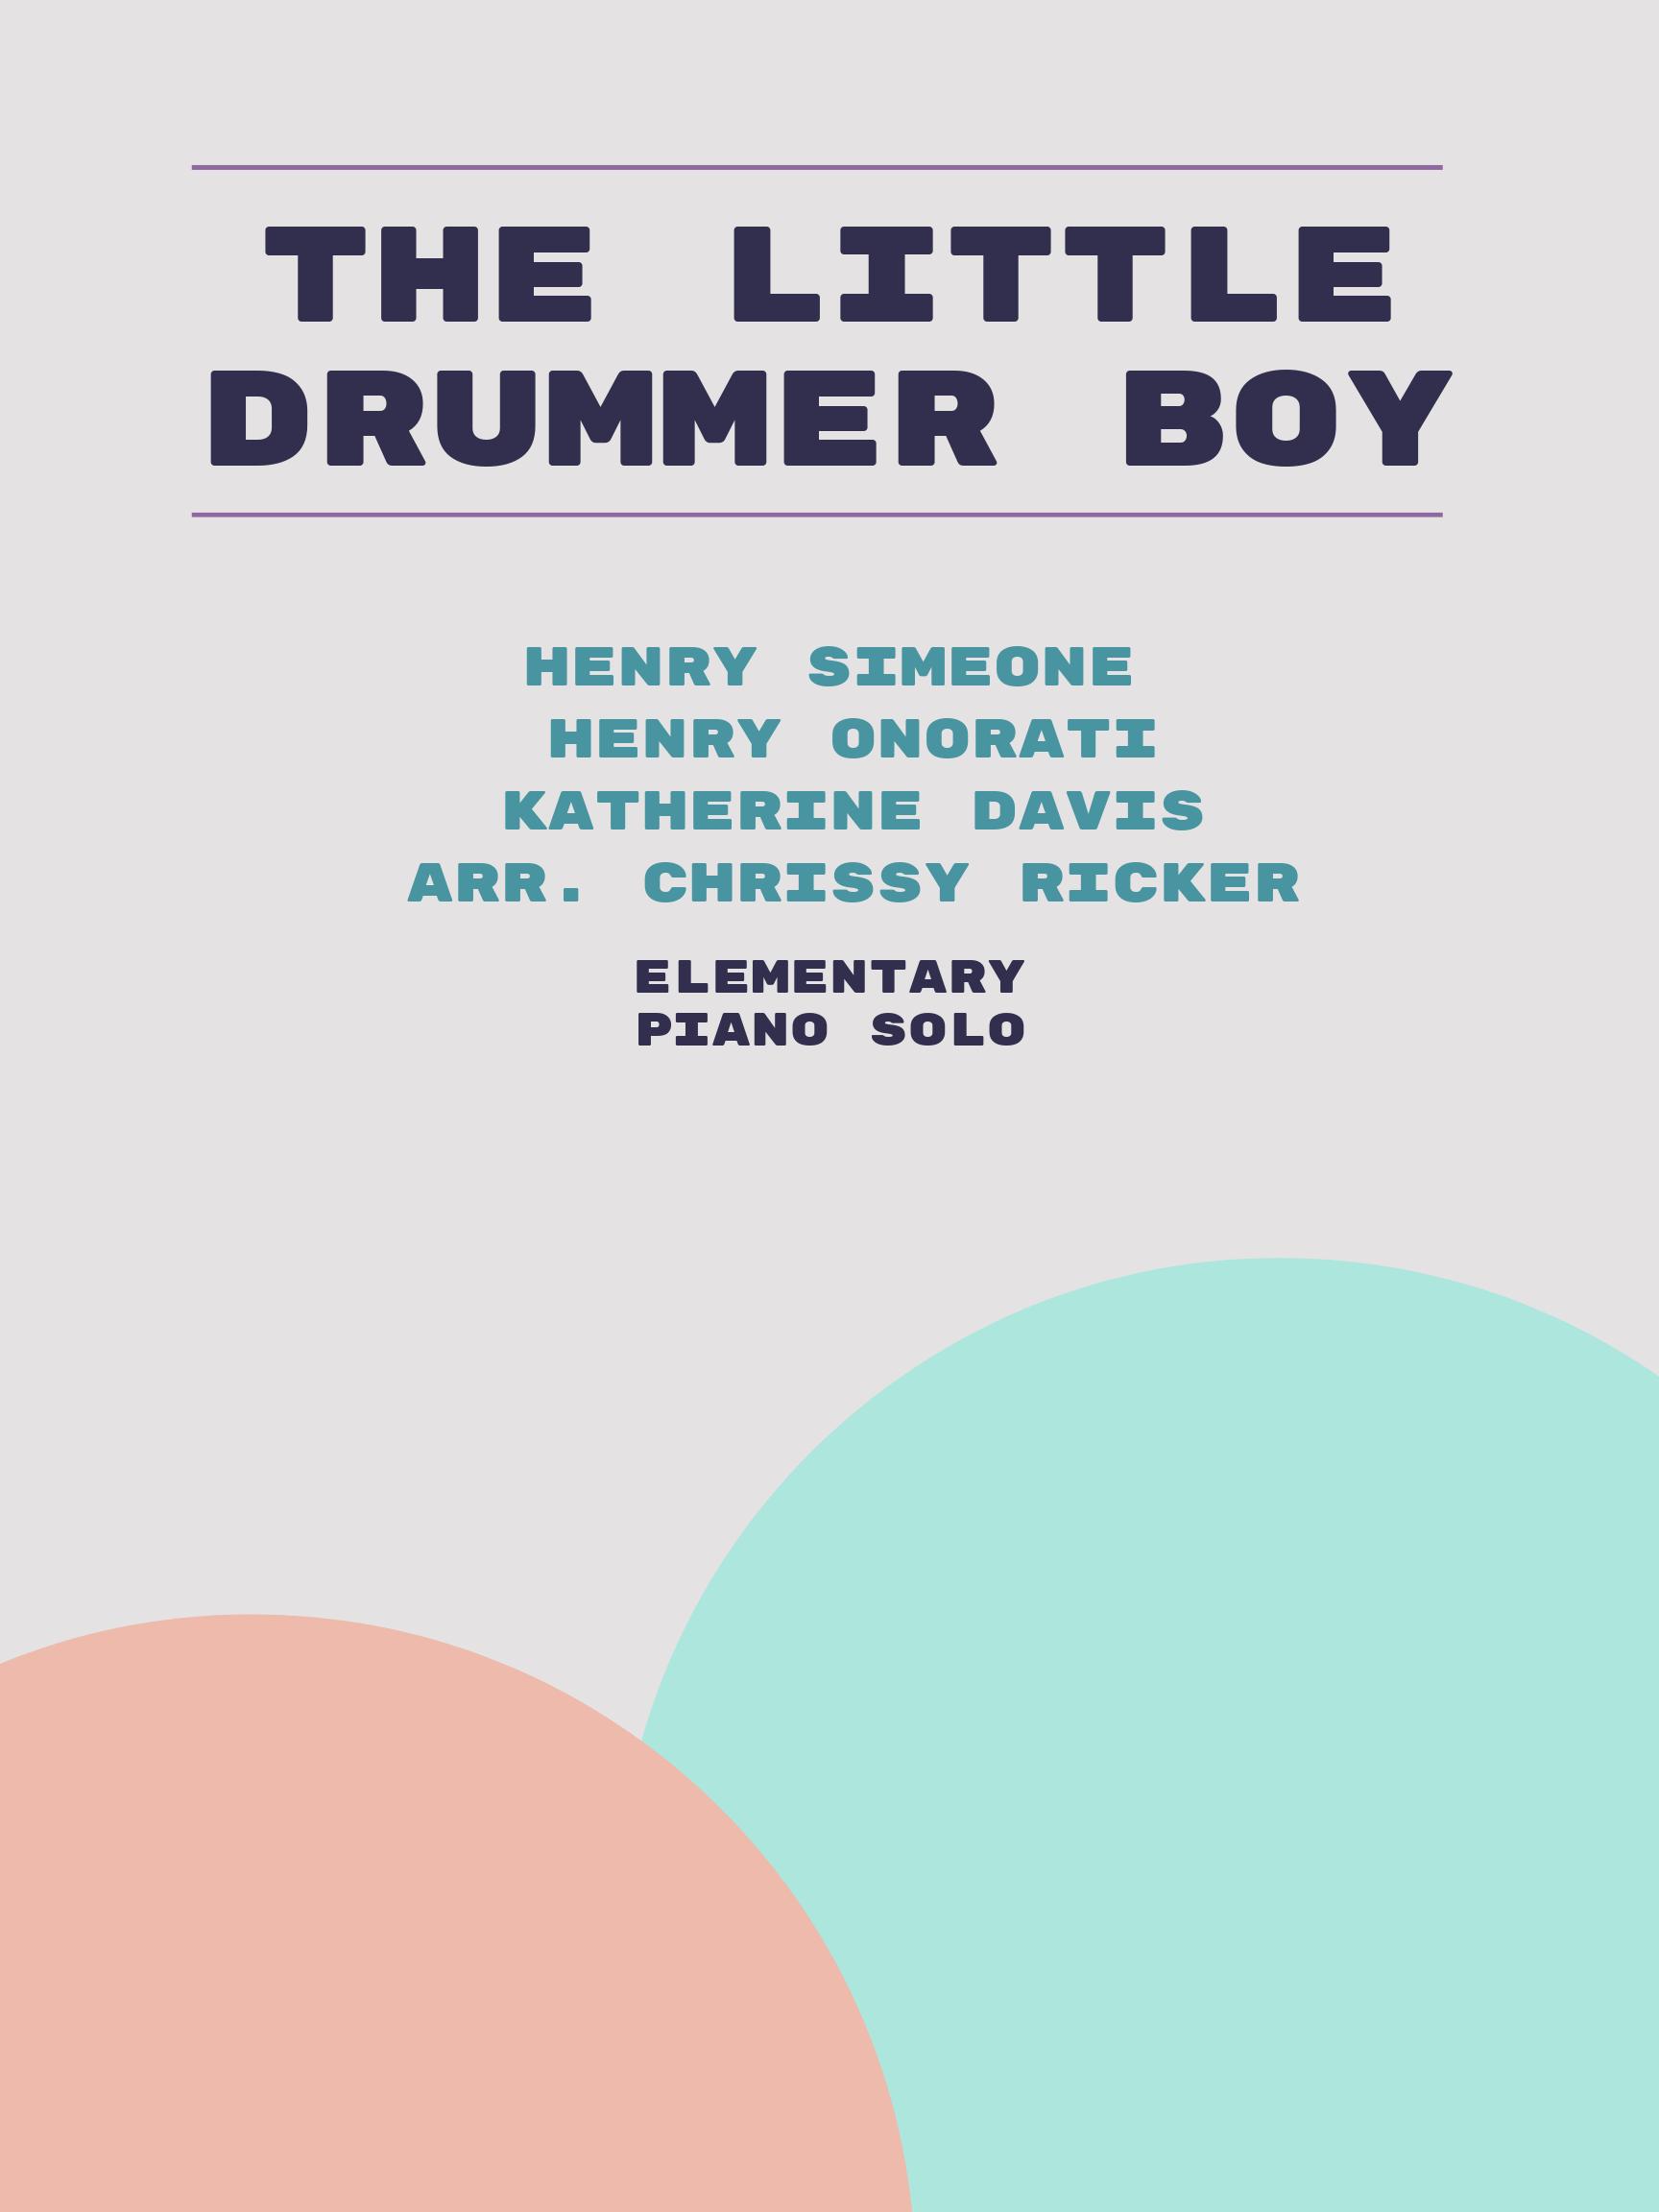 The Little Drummer Boy by Henry Onorati, Henry Simeone, Katherine Davis